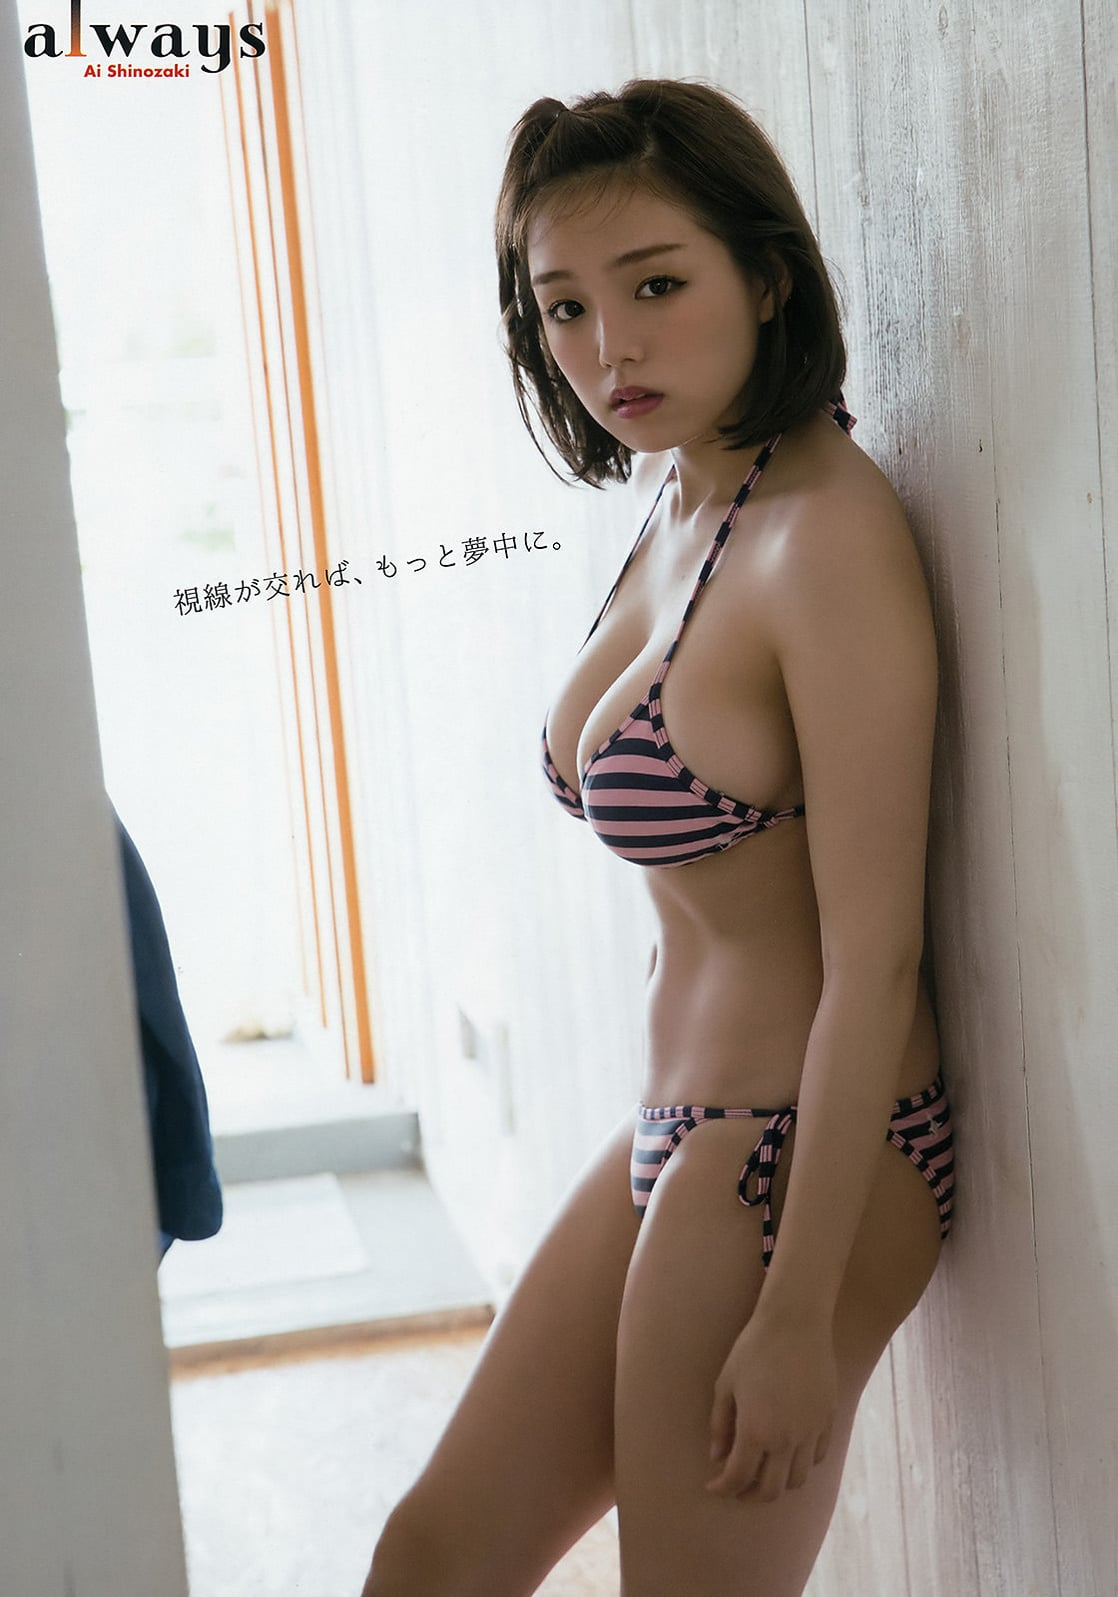 Shinozaki ai 41 Sexiest